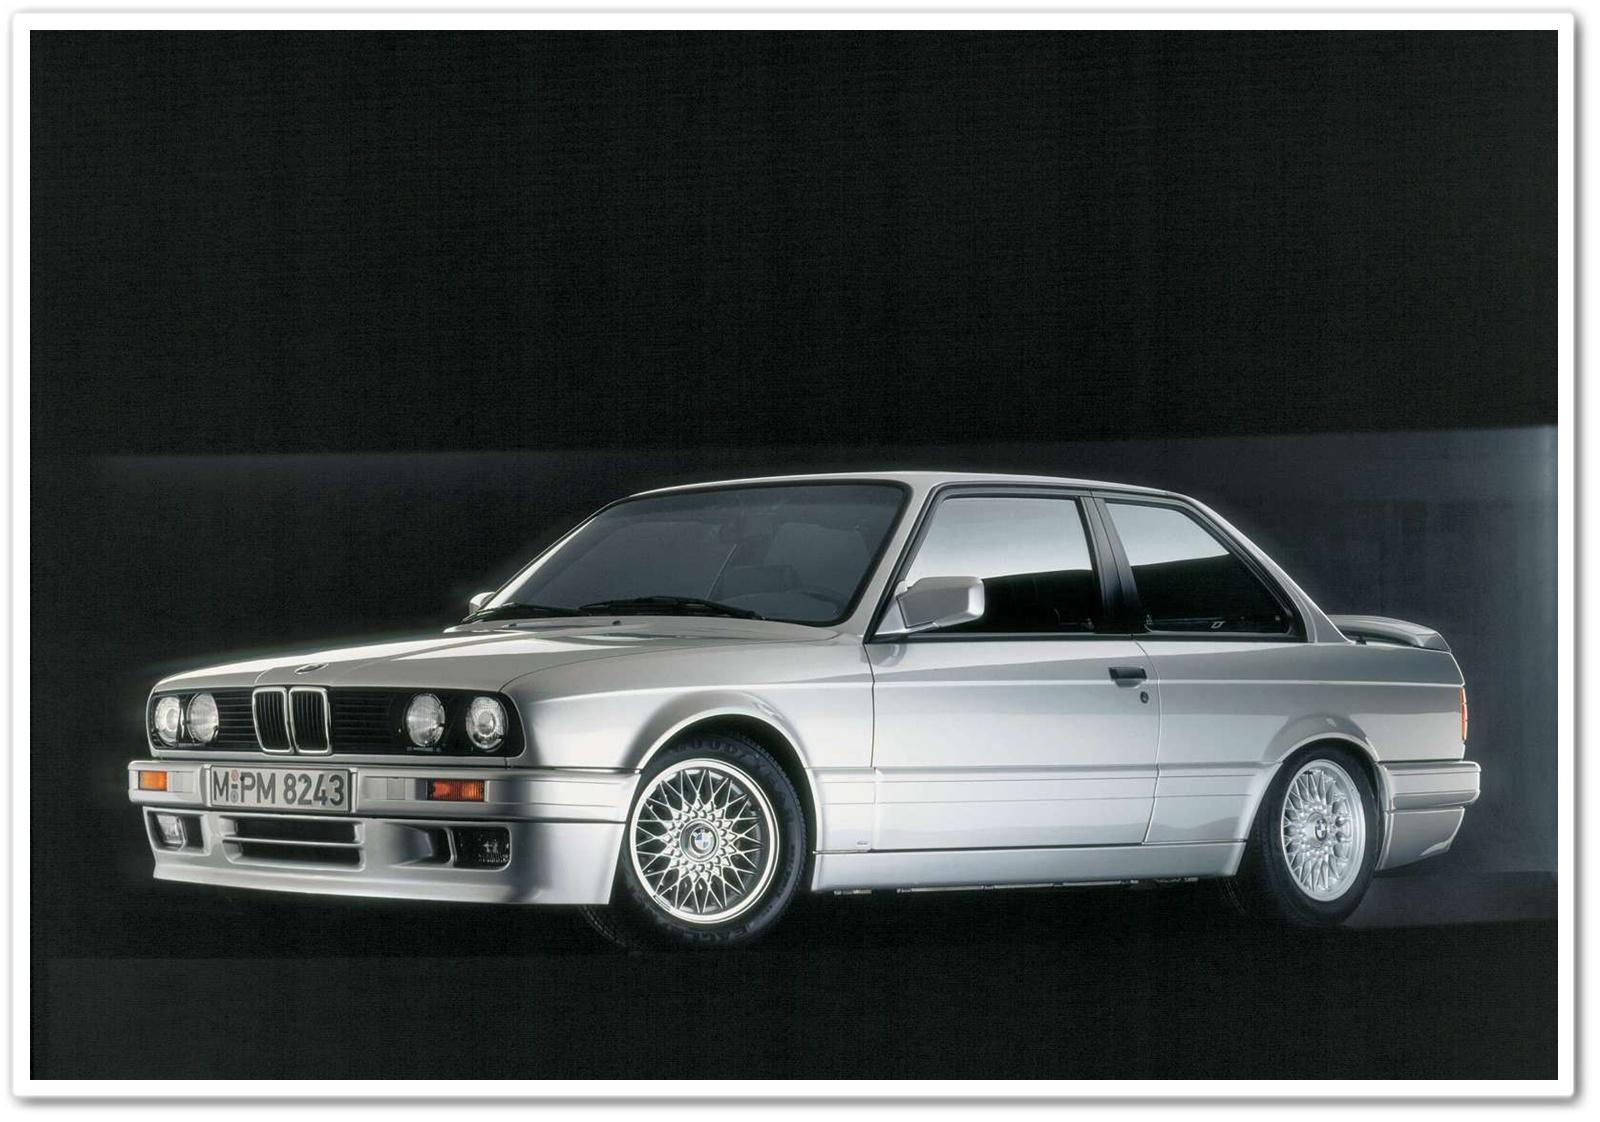 bmw 325i 1987 automotive world galerry wallpaper. Black Bedroom Furniture Sets. Home Design Ideas